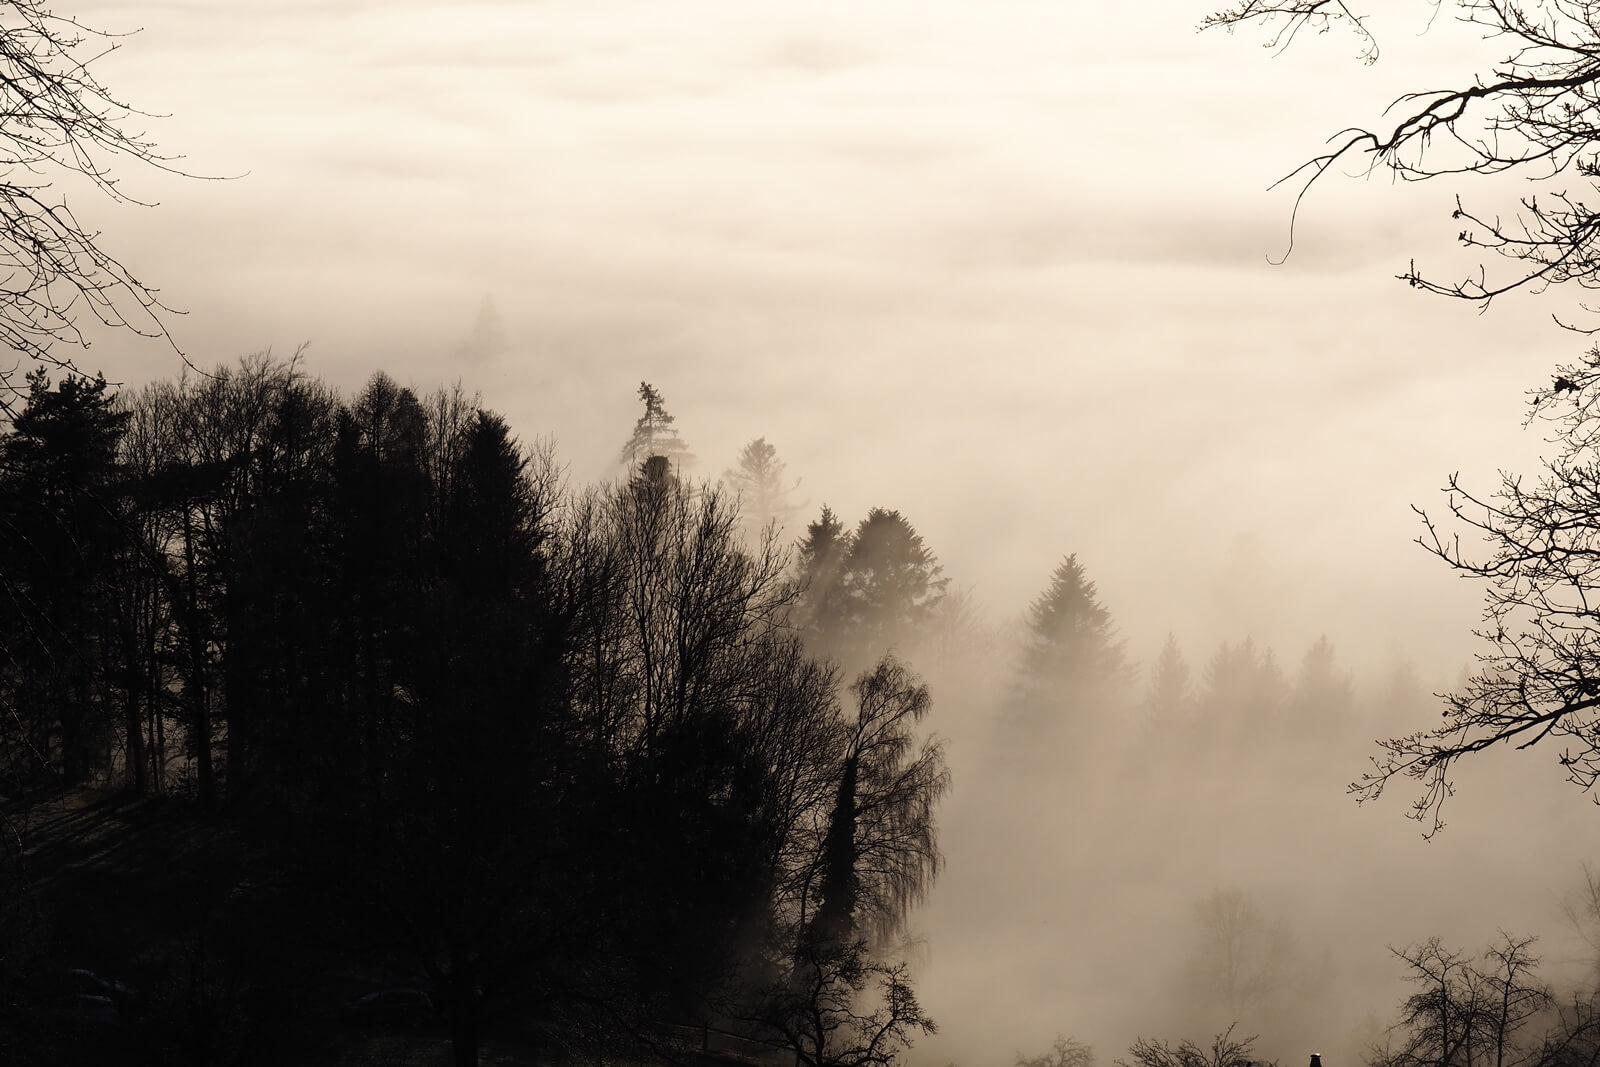 Nebelmeer at Bachtel - Sea of Fog aboove Switzerland